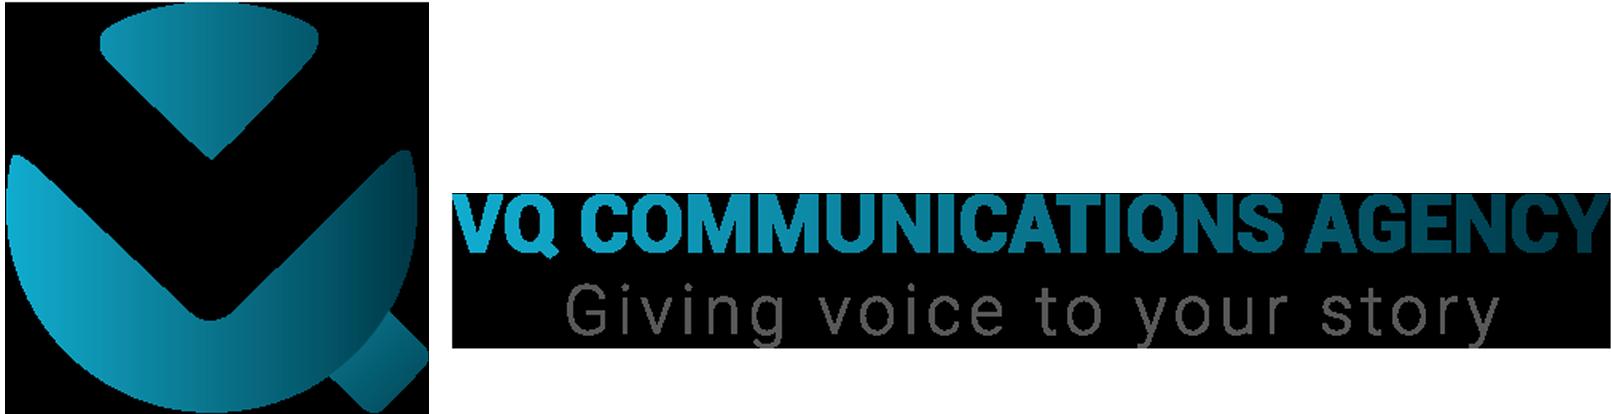 VQ Communications Agency